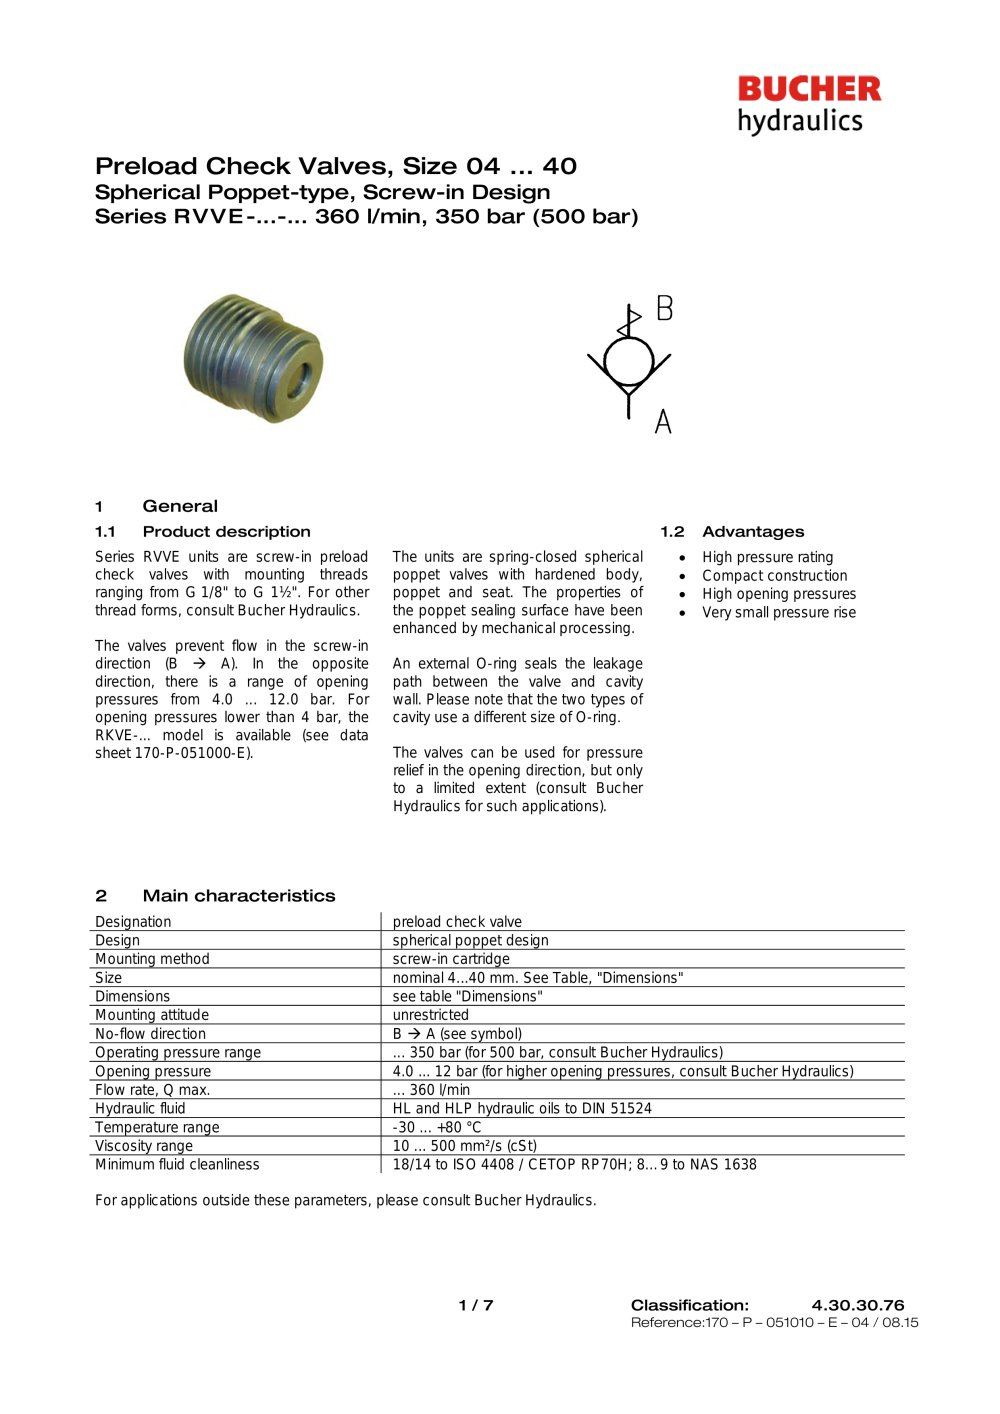 Preload Check Valves Size 04 40 Bucher Hydraulics Pdf